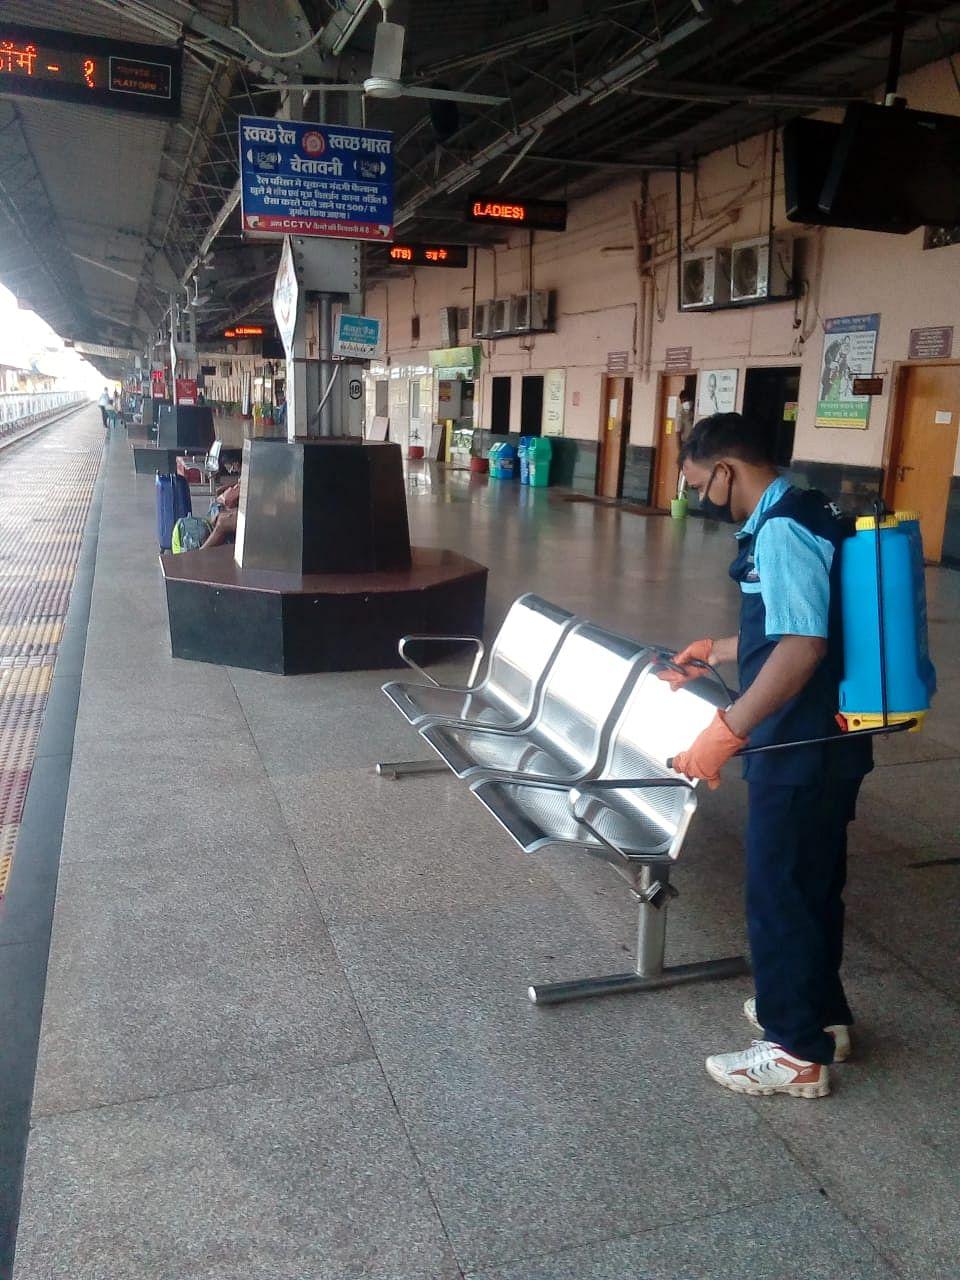 स्वच्छ-रेल ,स्वच्छ-भारत के तहत स्वच्छता-पखवाडा का आयोजन